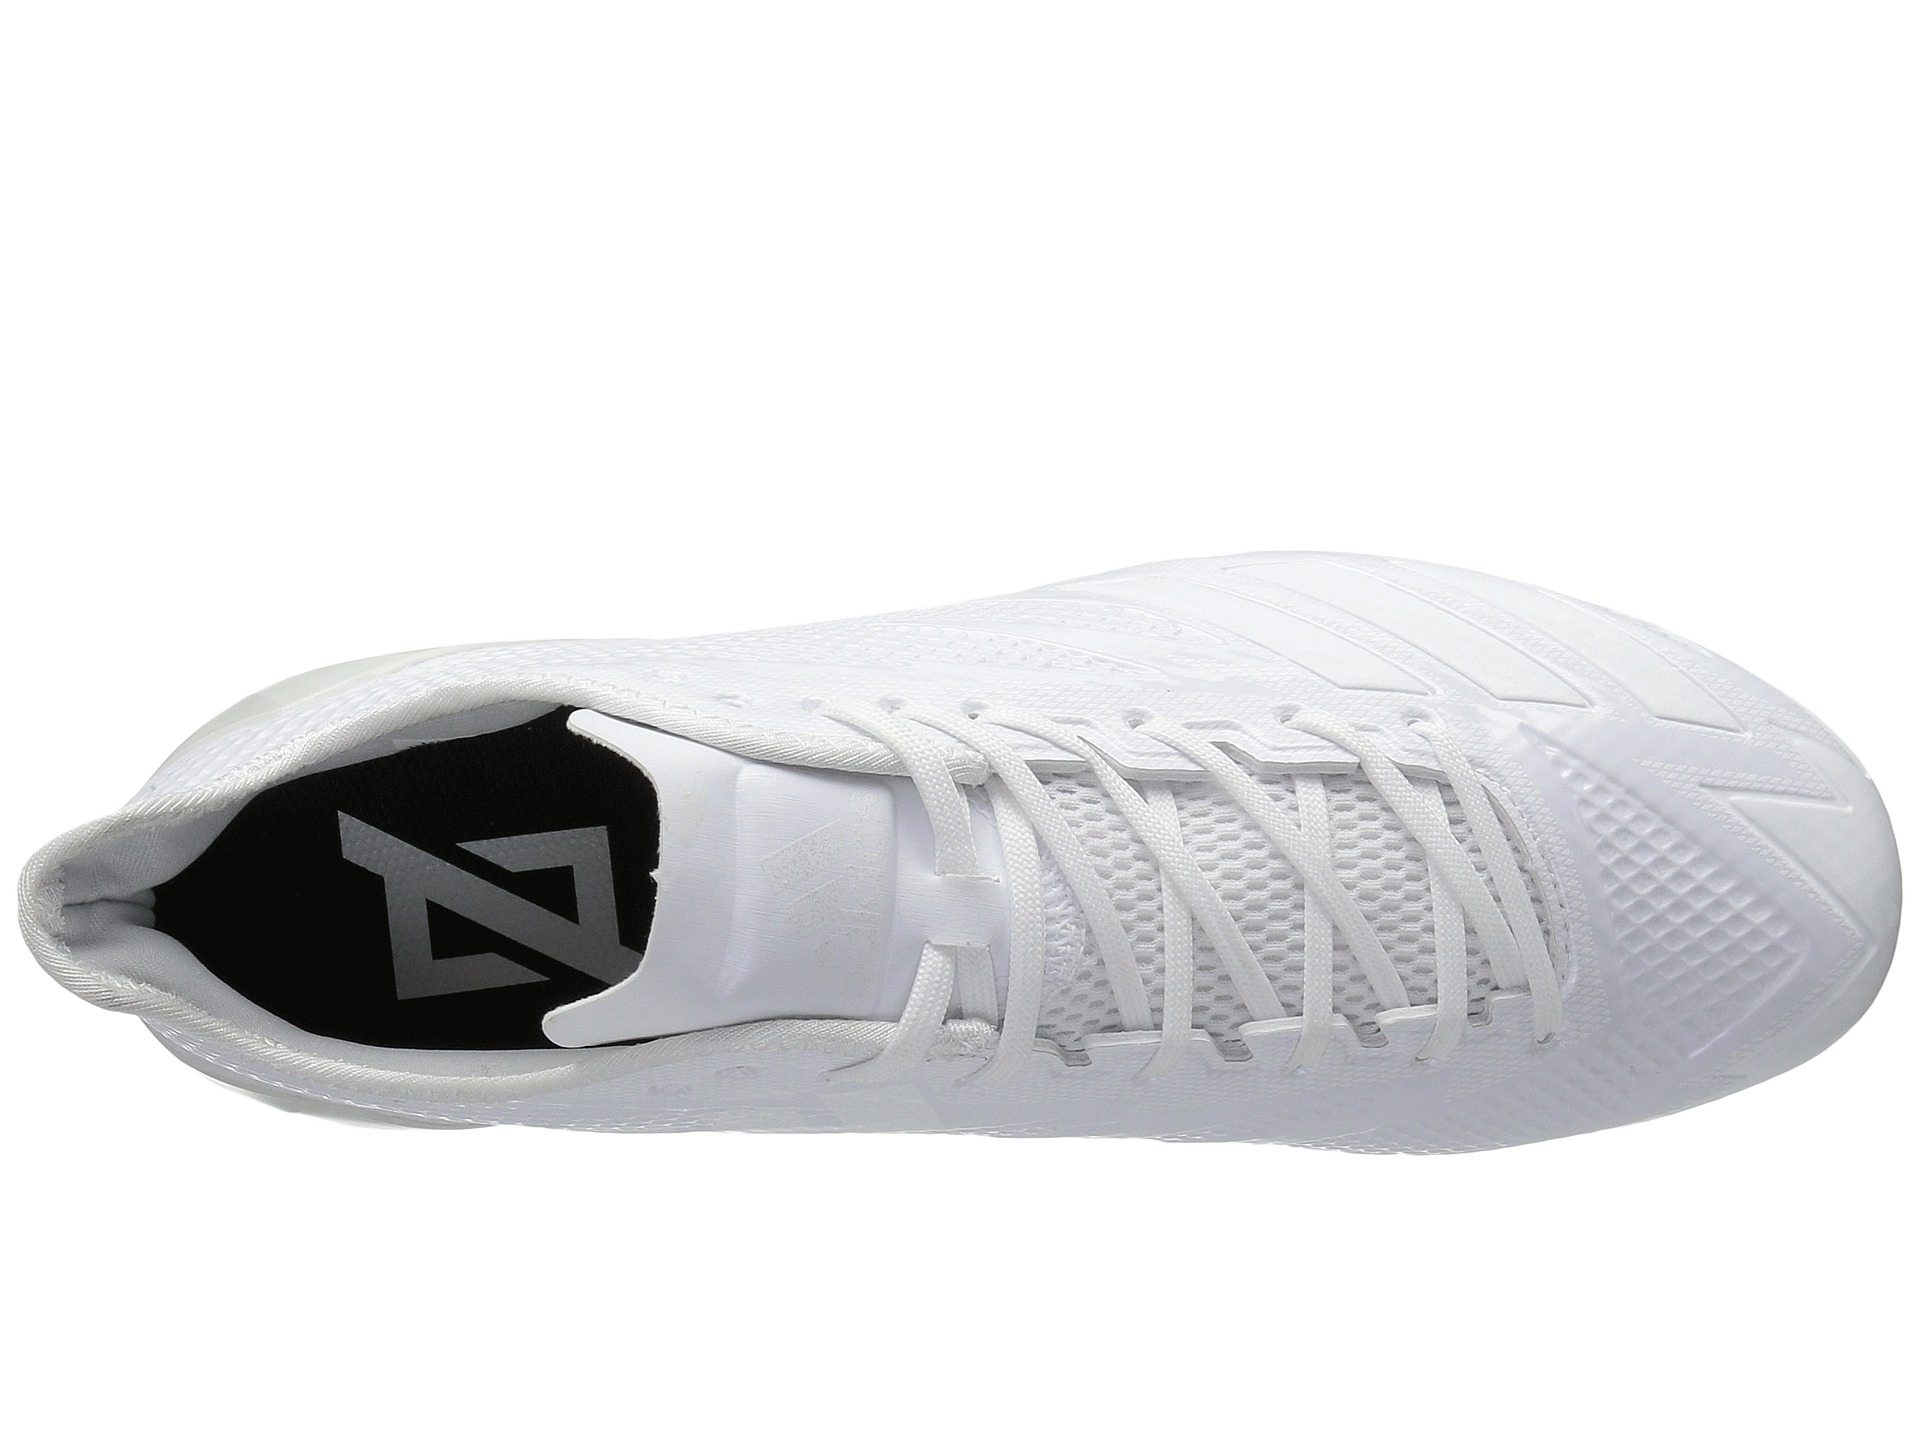 Adidas Adizero 5 Étoiles 6,0 Jeunes